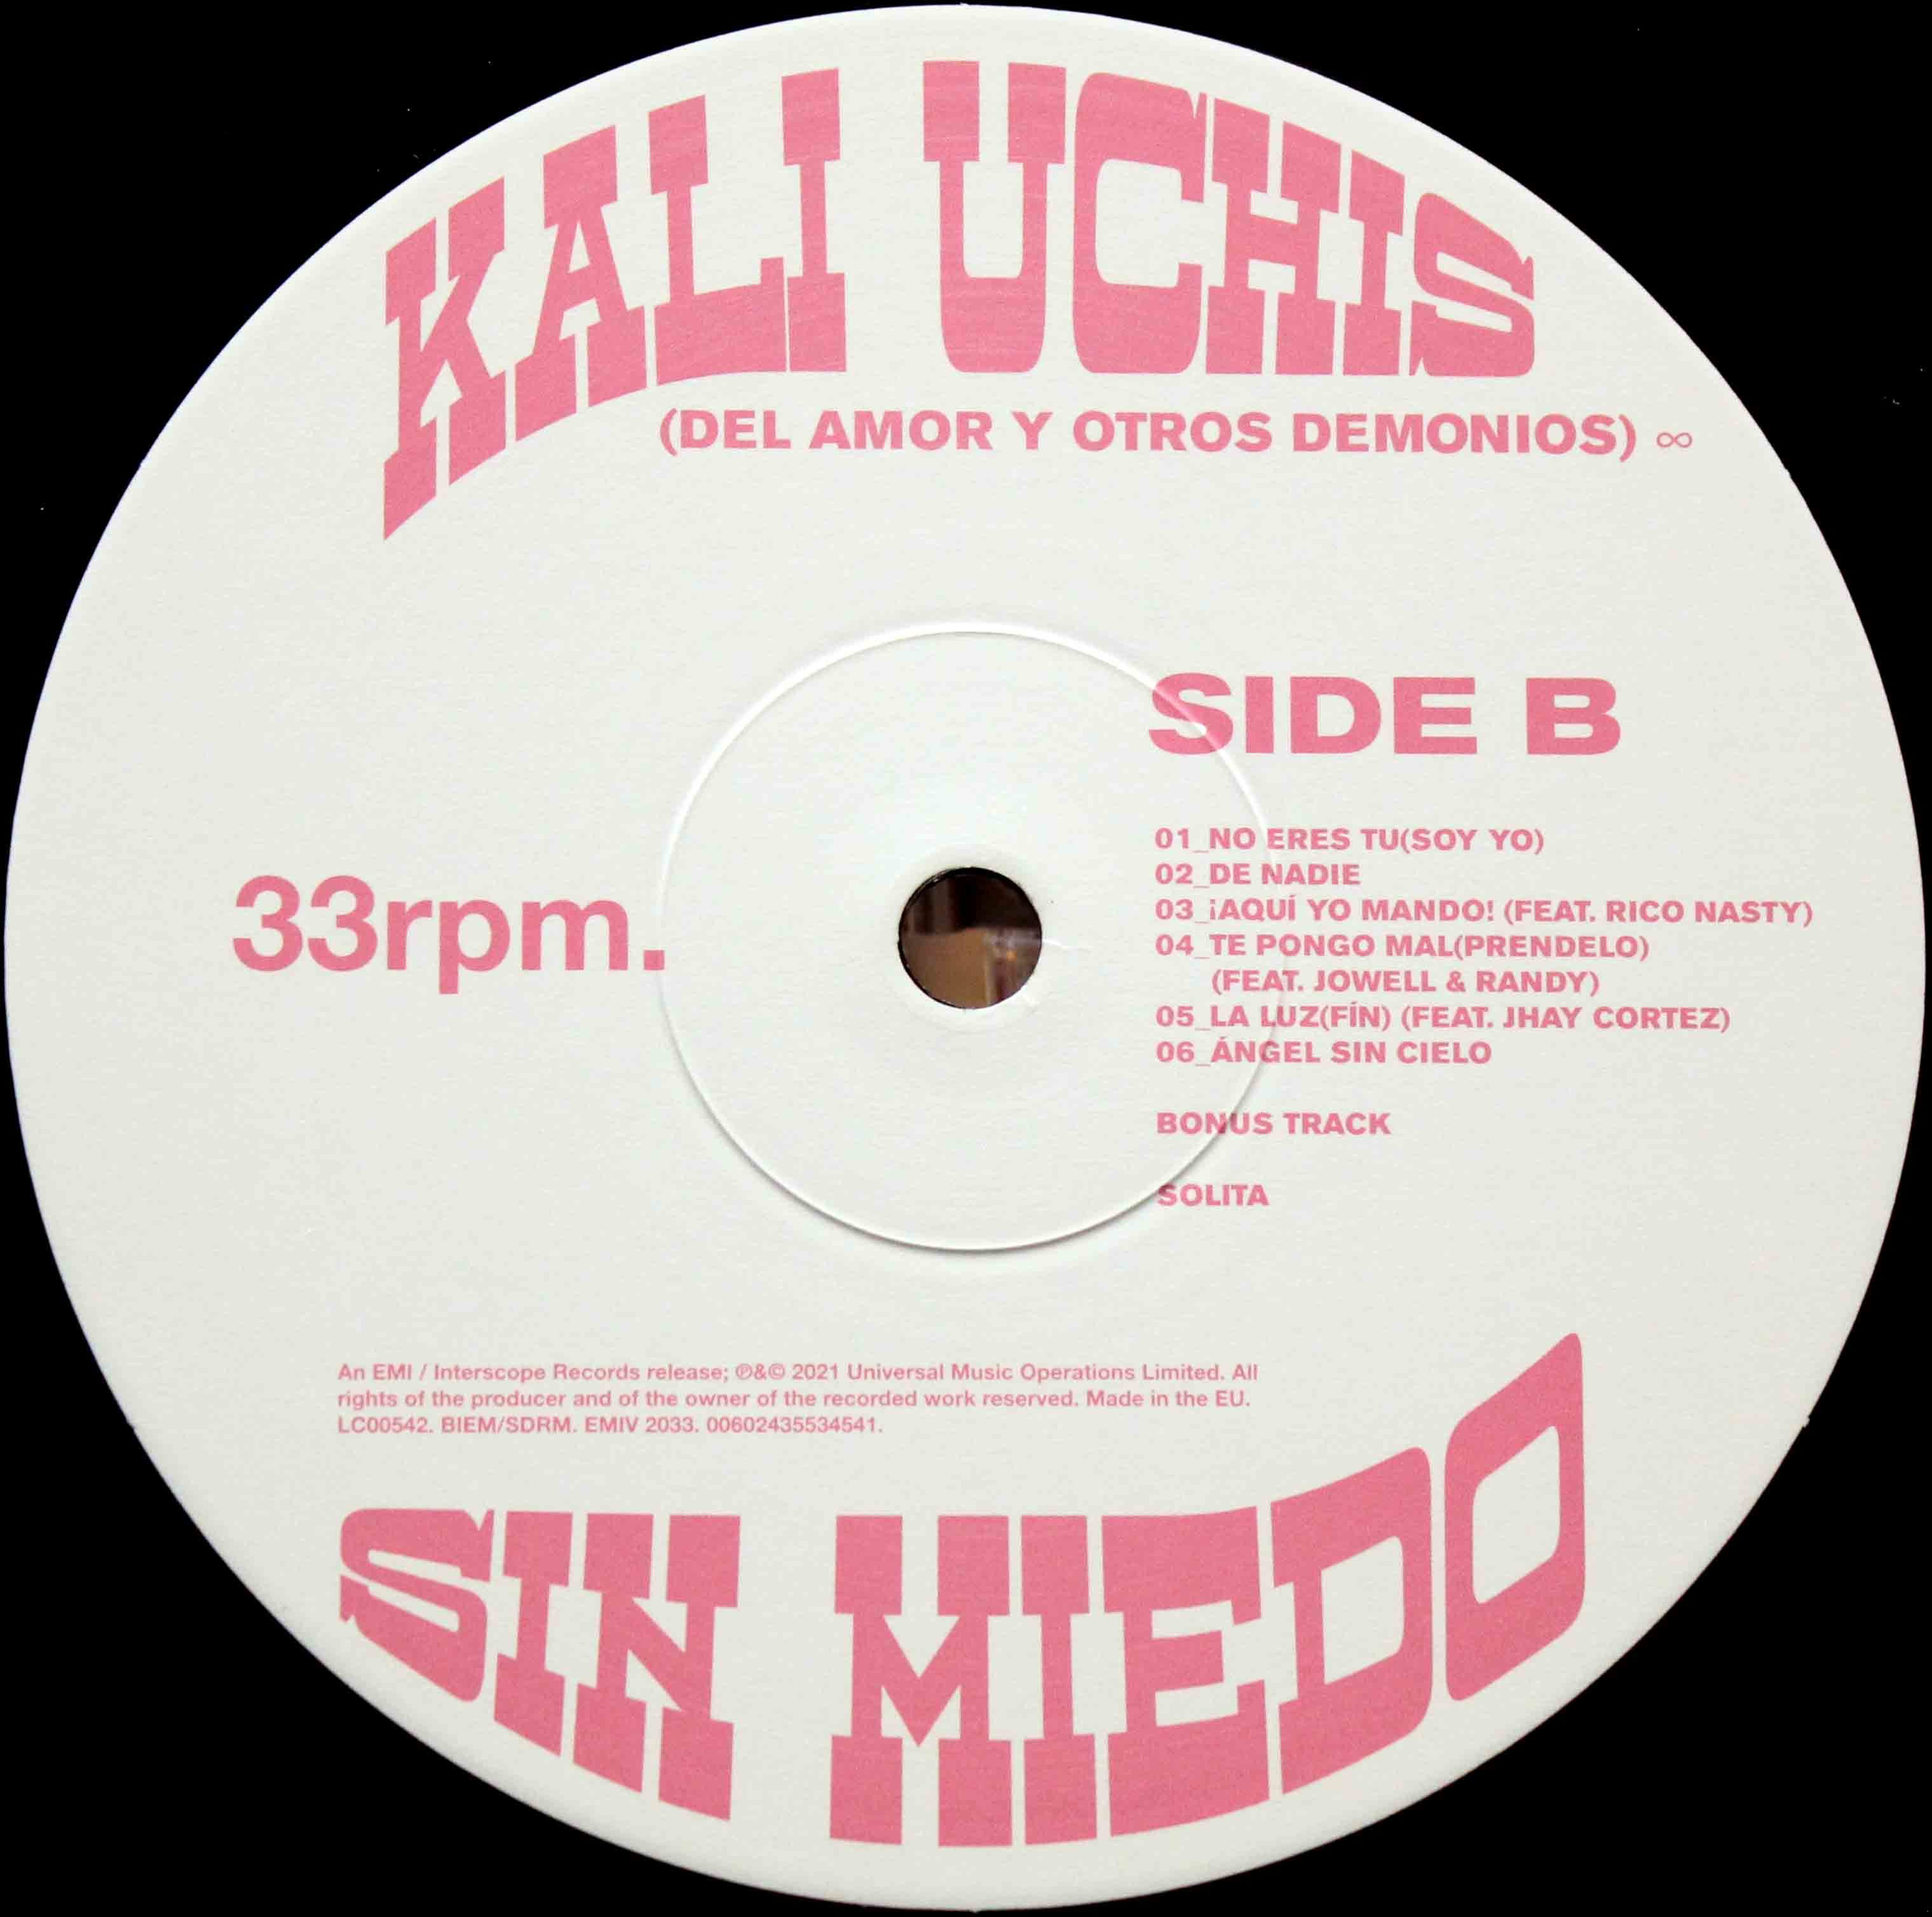 Kali Uchis - Sin Miedo 06